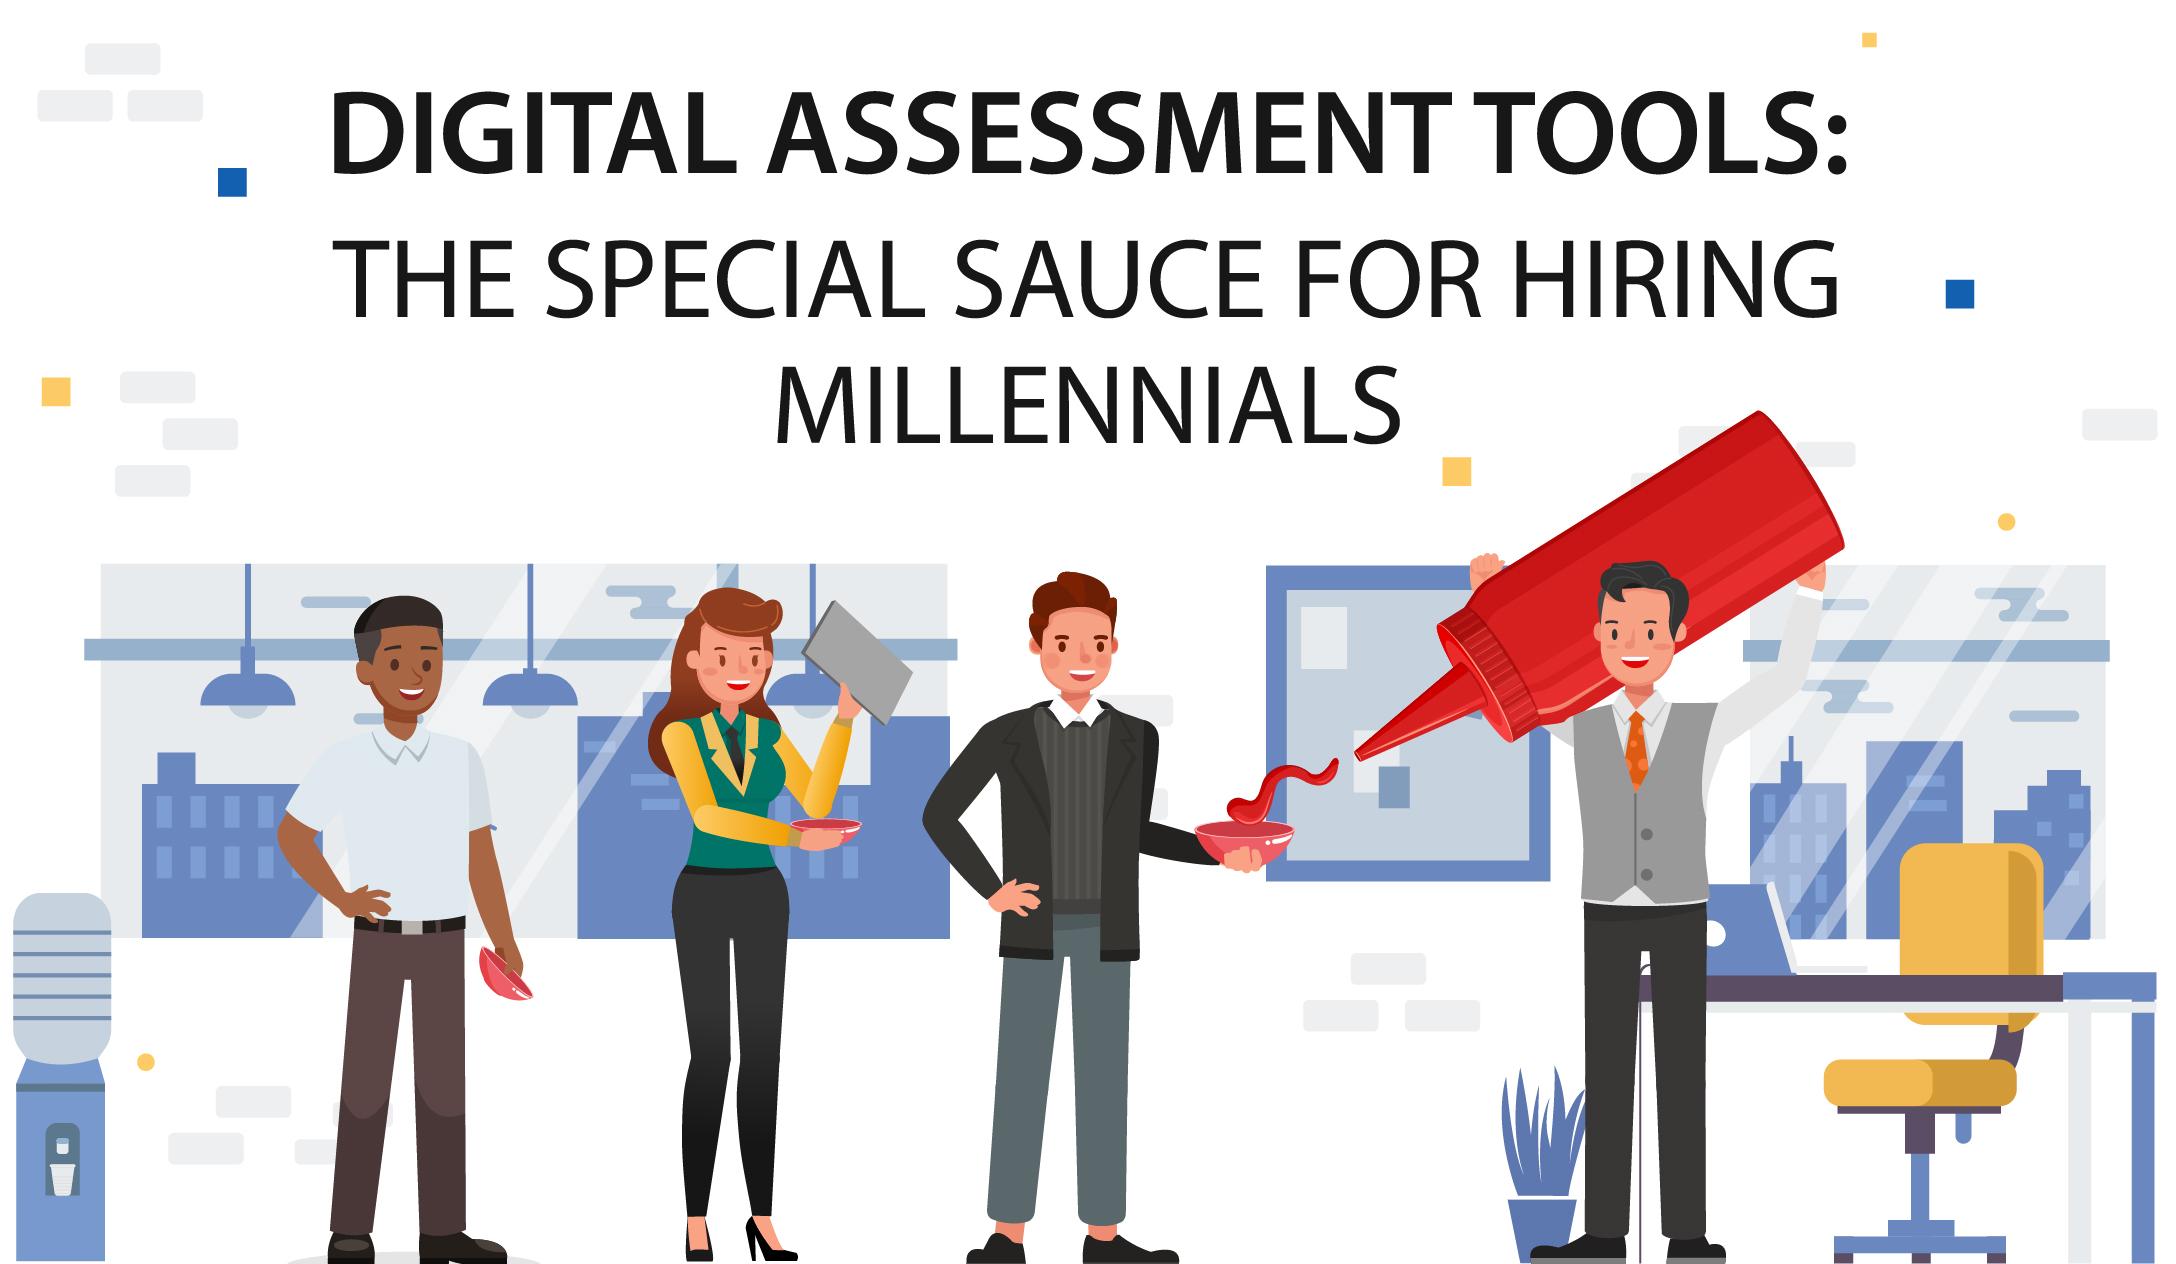 Digital Assessment Tools